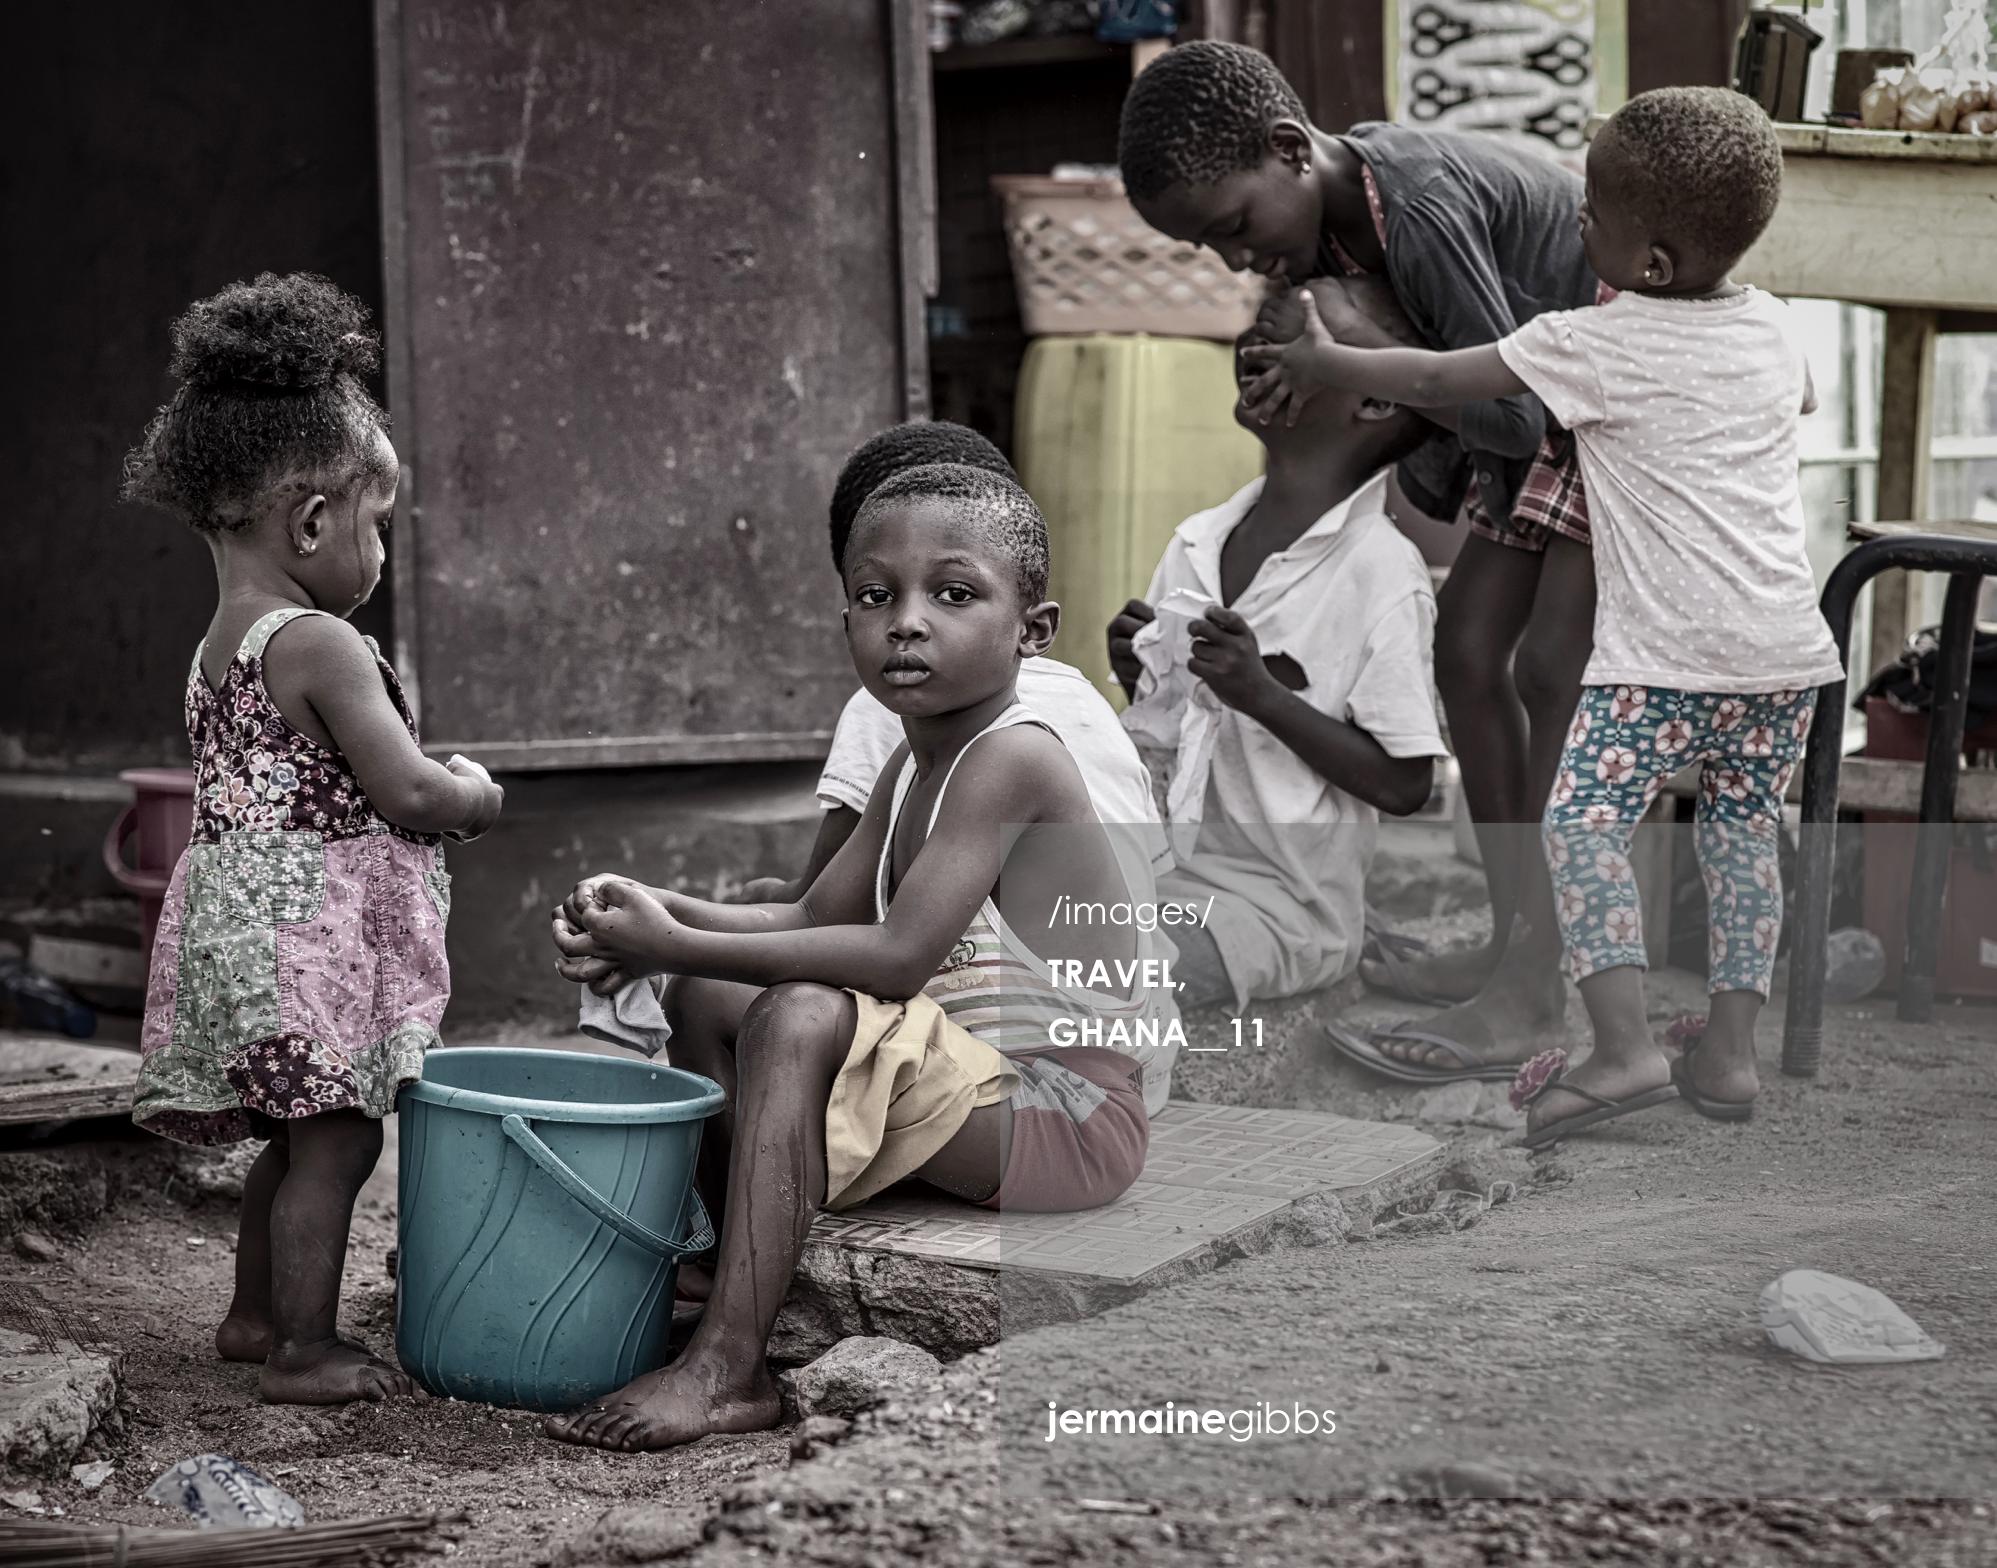 Travel_Ghana__11